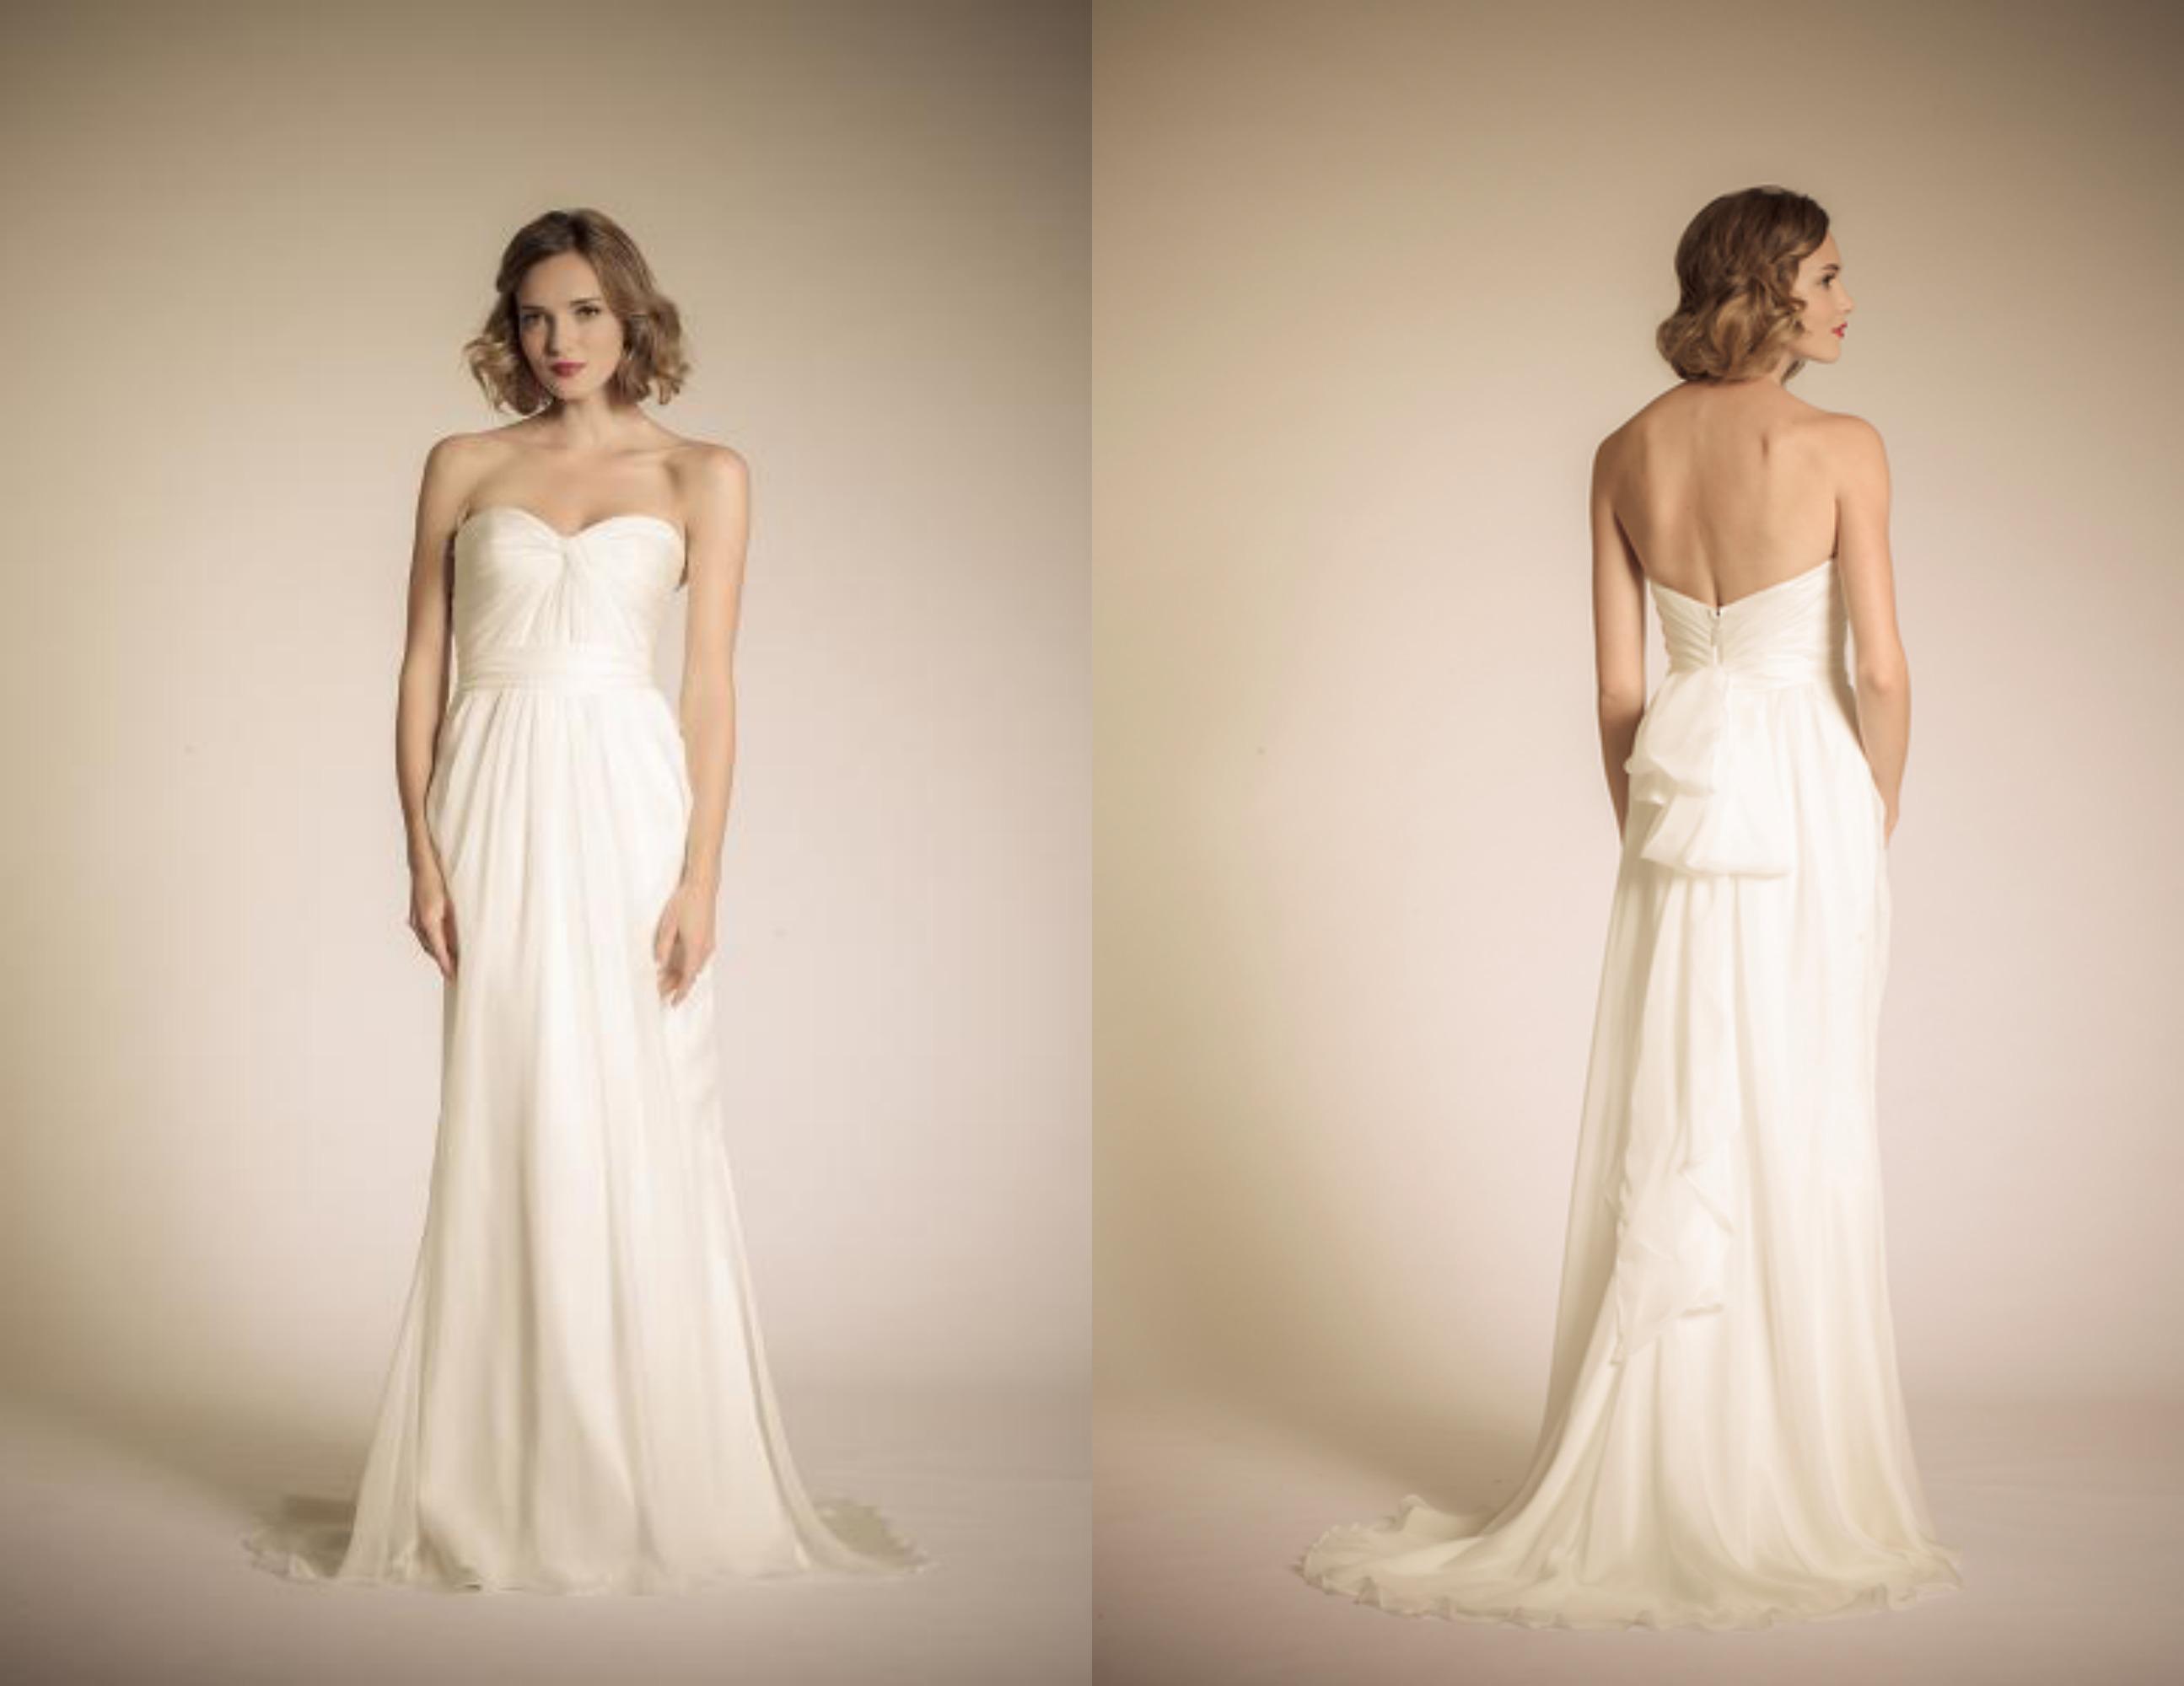 preppy strapless wedding gowns preppy wedding style With preppy wedding dresses